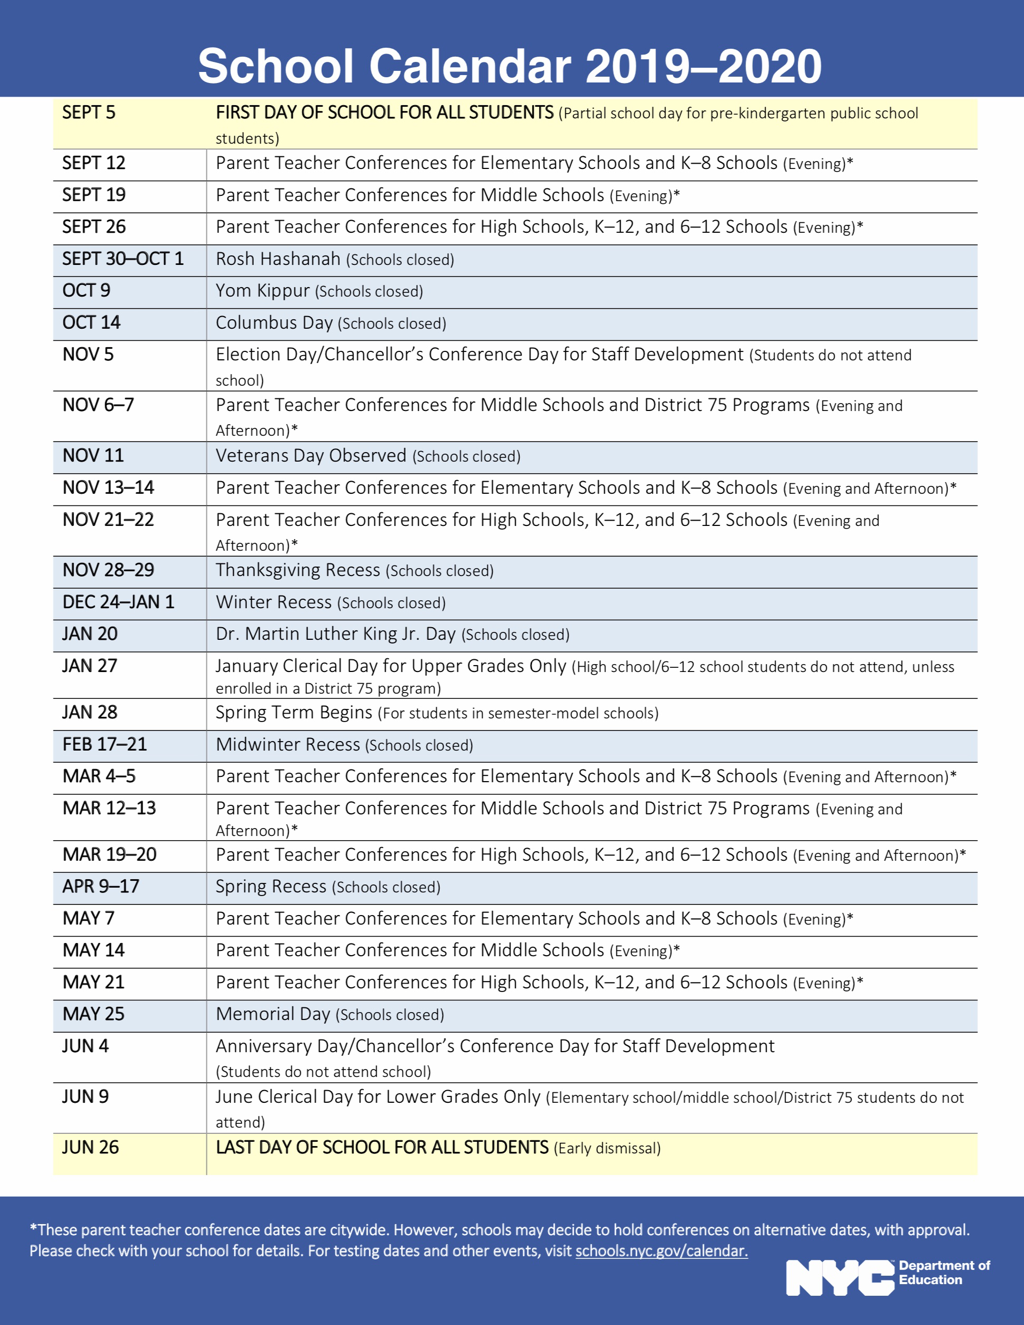 Calendars For Staten Island College Callendar